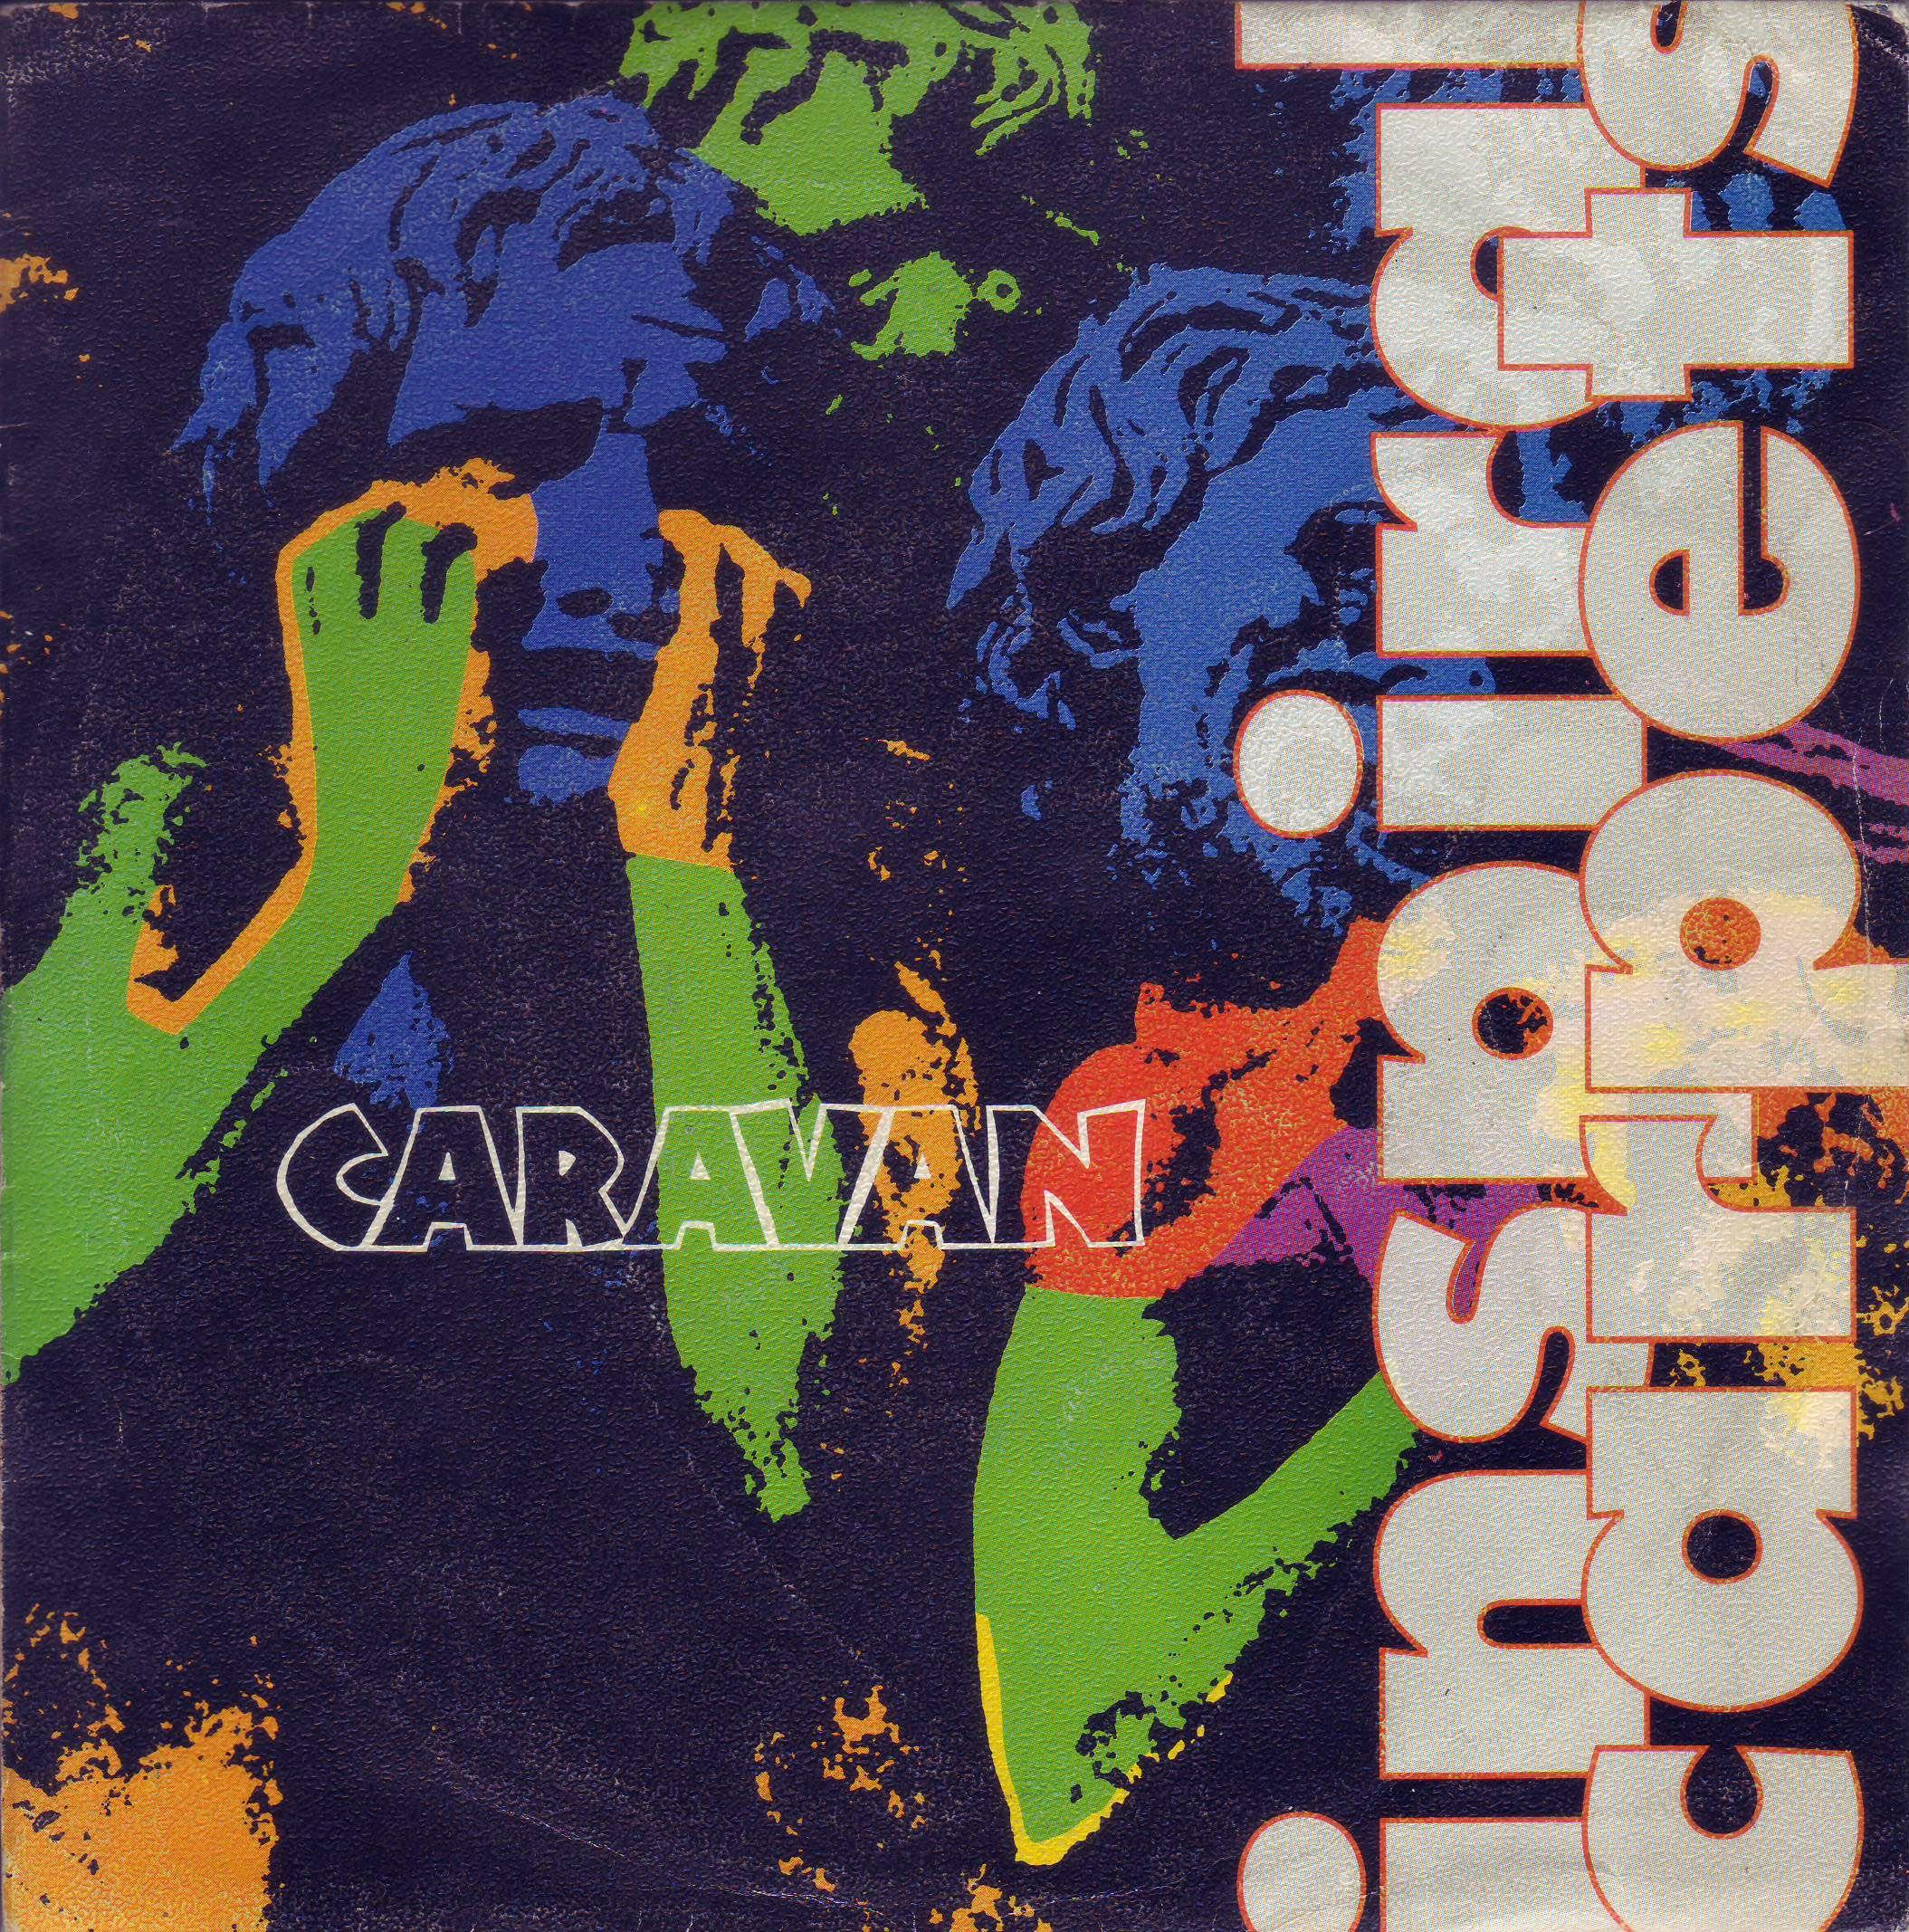 vinyl-inspiral-carpets-caravan-front #portadavinilo #covervinyl #7inch #single #vinilo #vinyl #portada #cover #inspiralcarpets